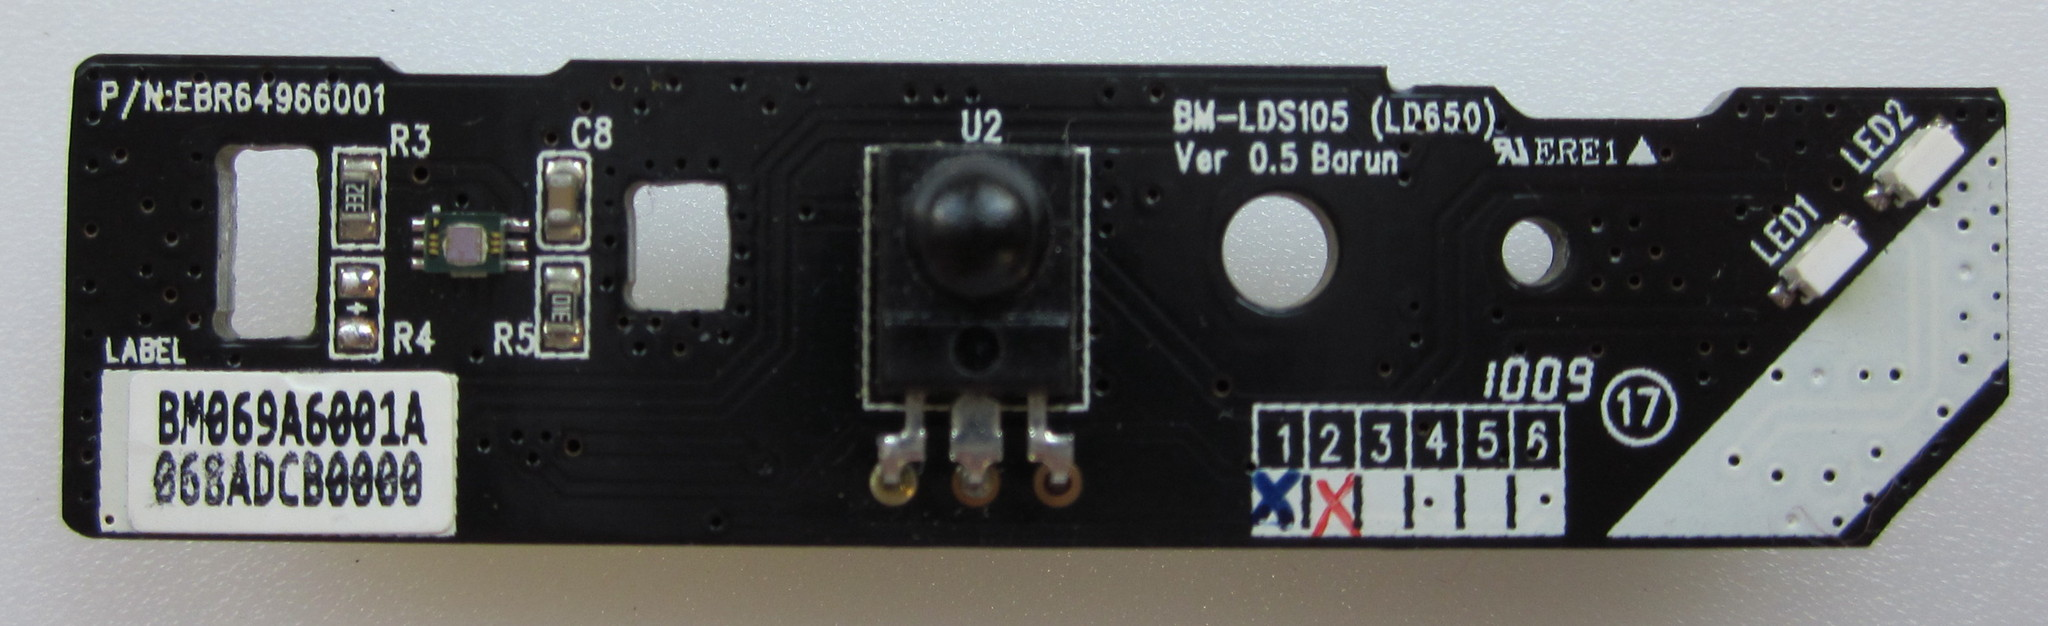 BM-LDS105 (LD650) Ver 0,5